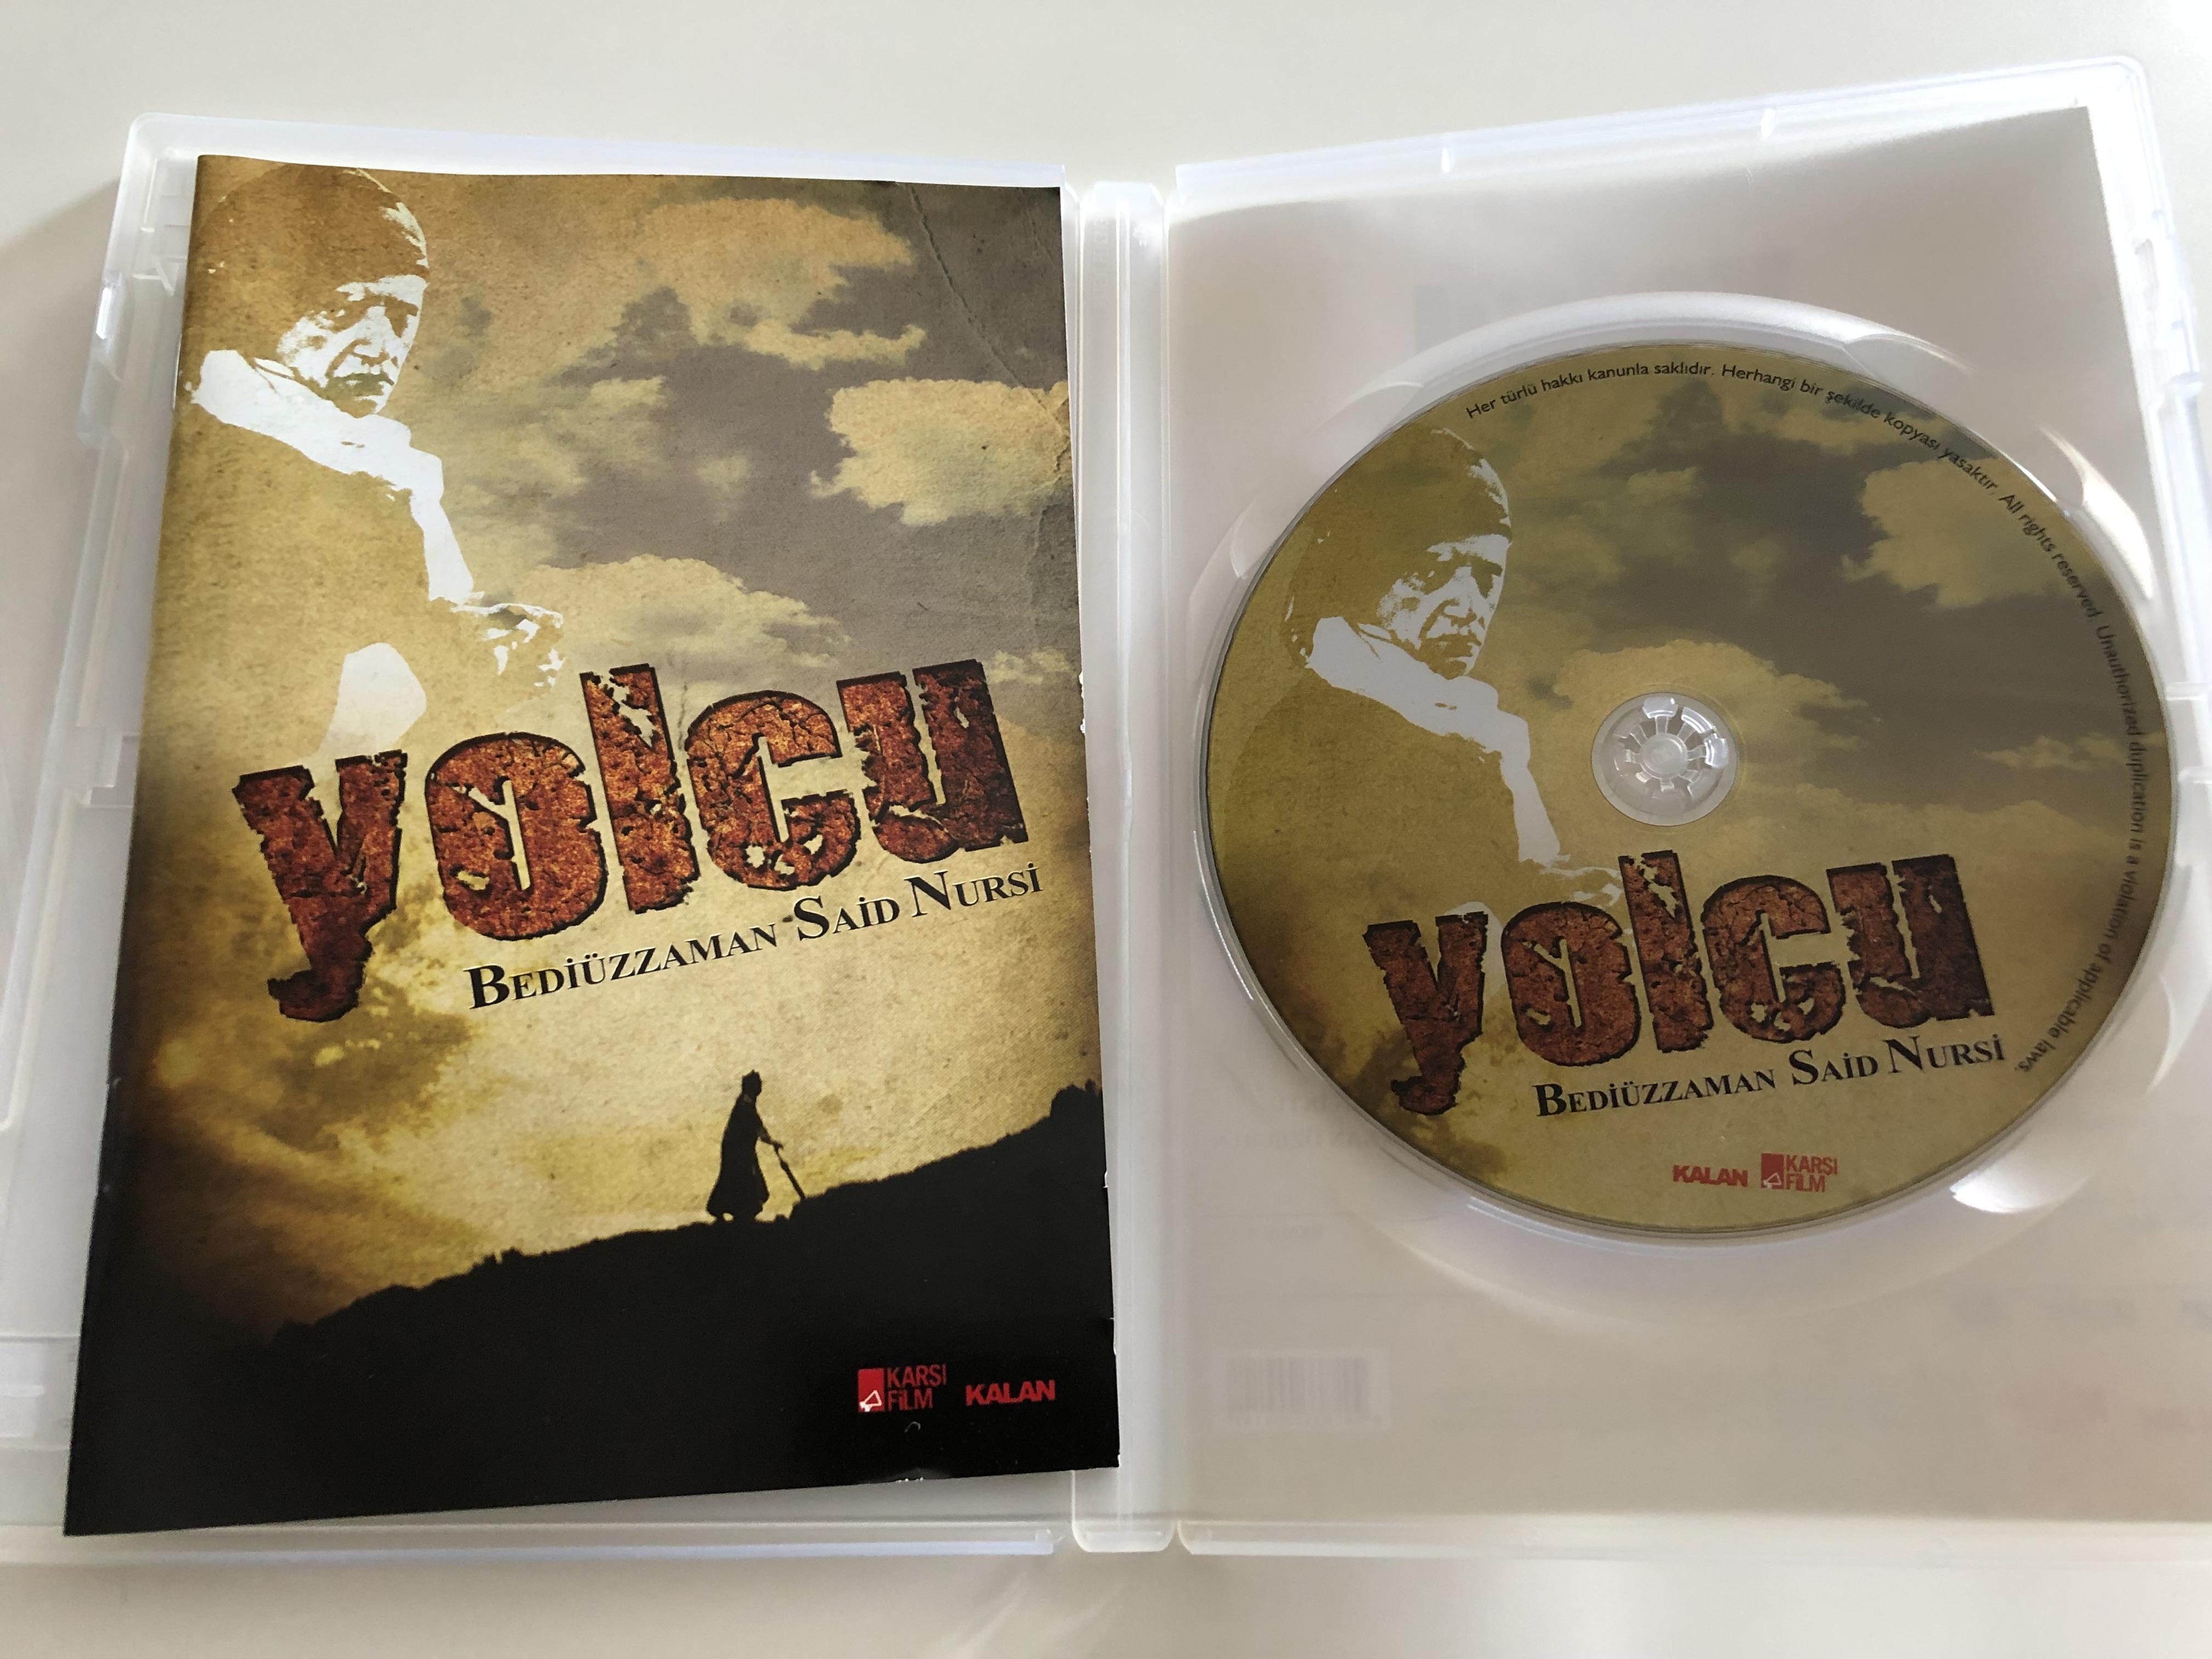 -yolcu-bedi-zzaman-said-nursi-dvd-1994-passenger-directed-by-yusuf-kenan-beys-len-3-.jpg